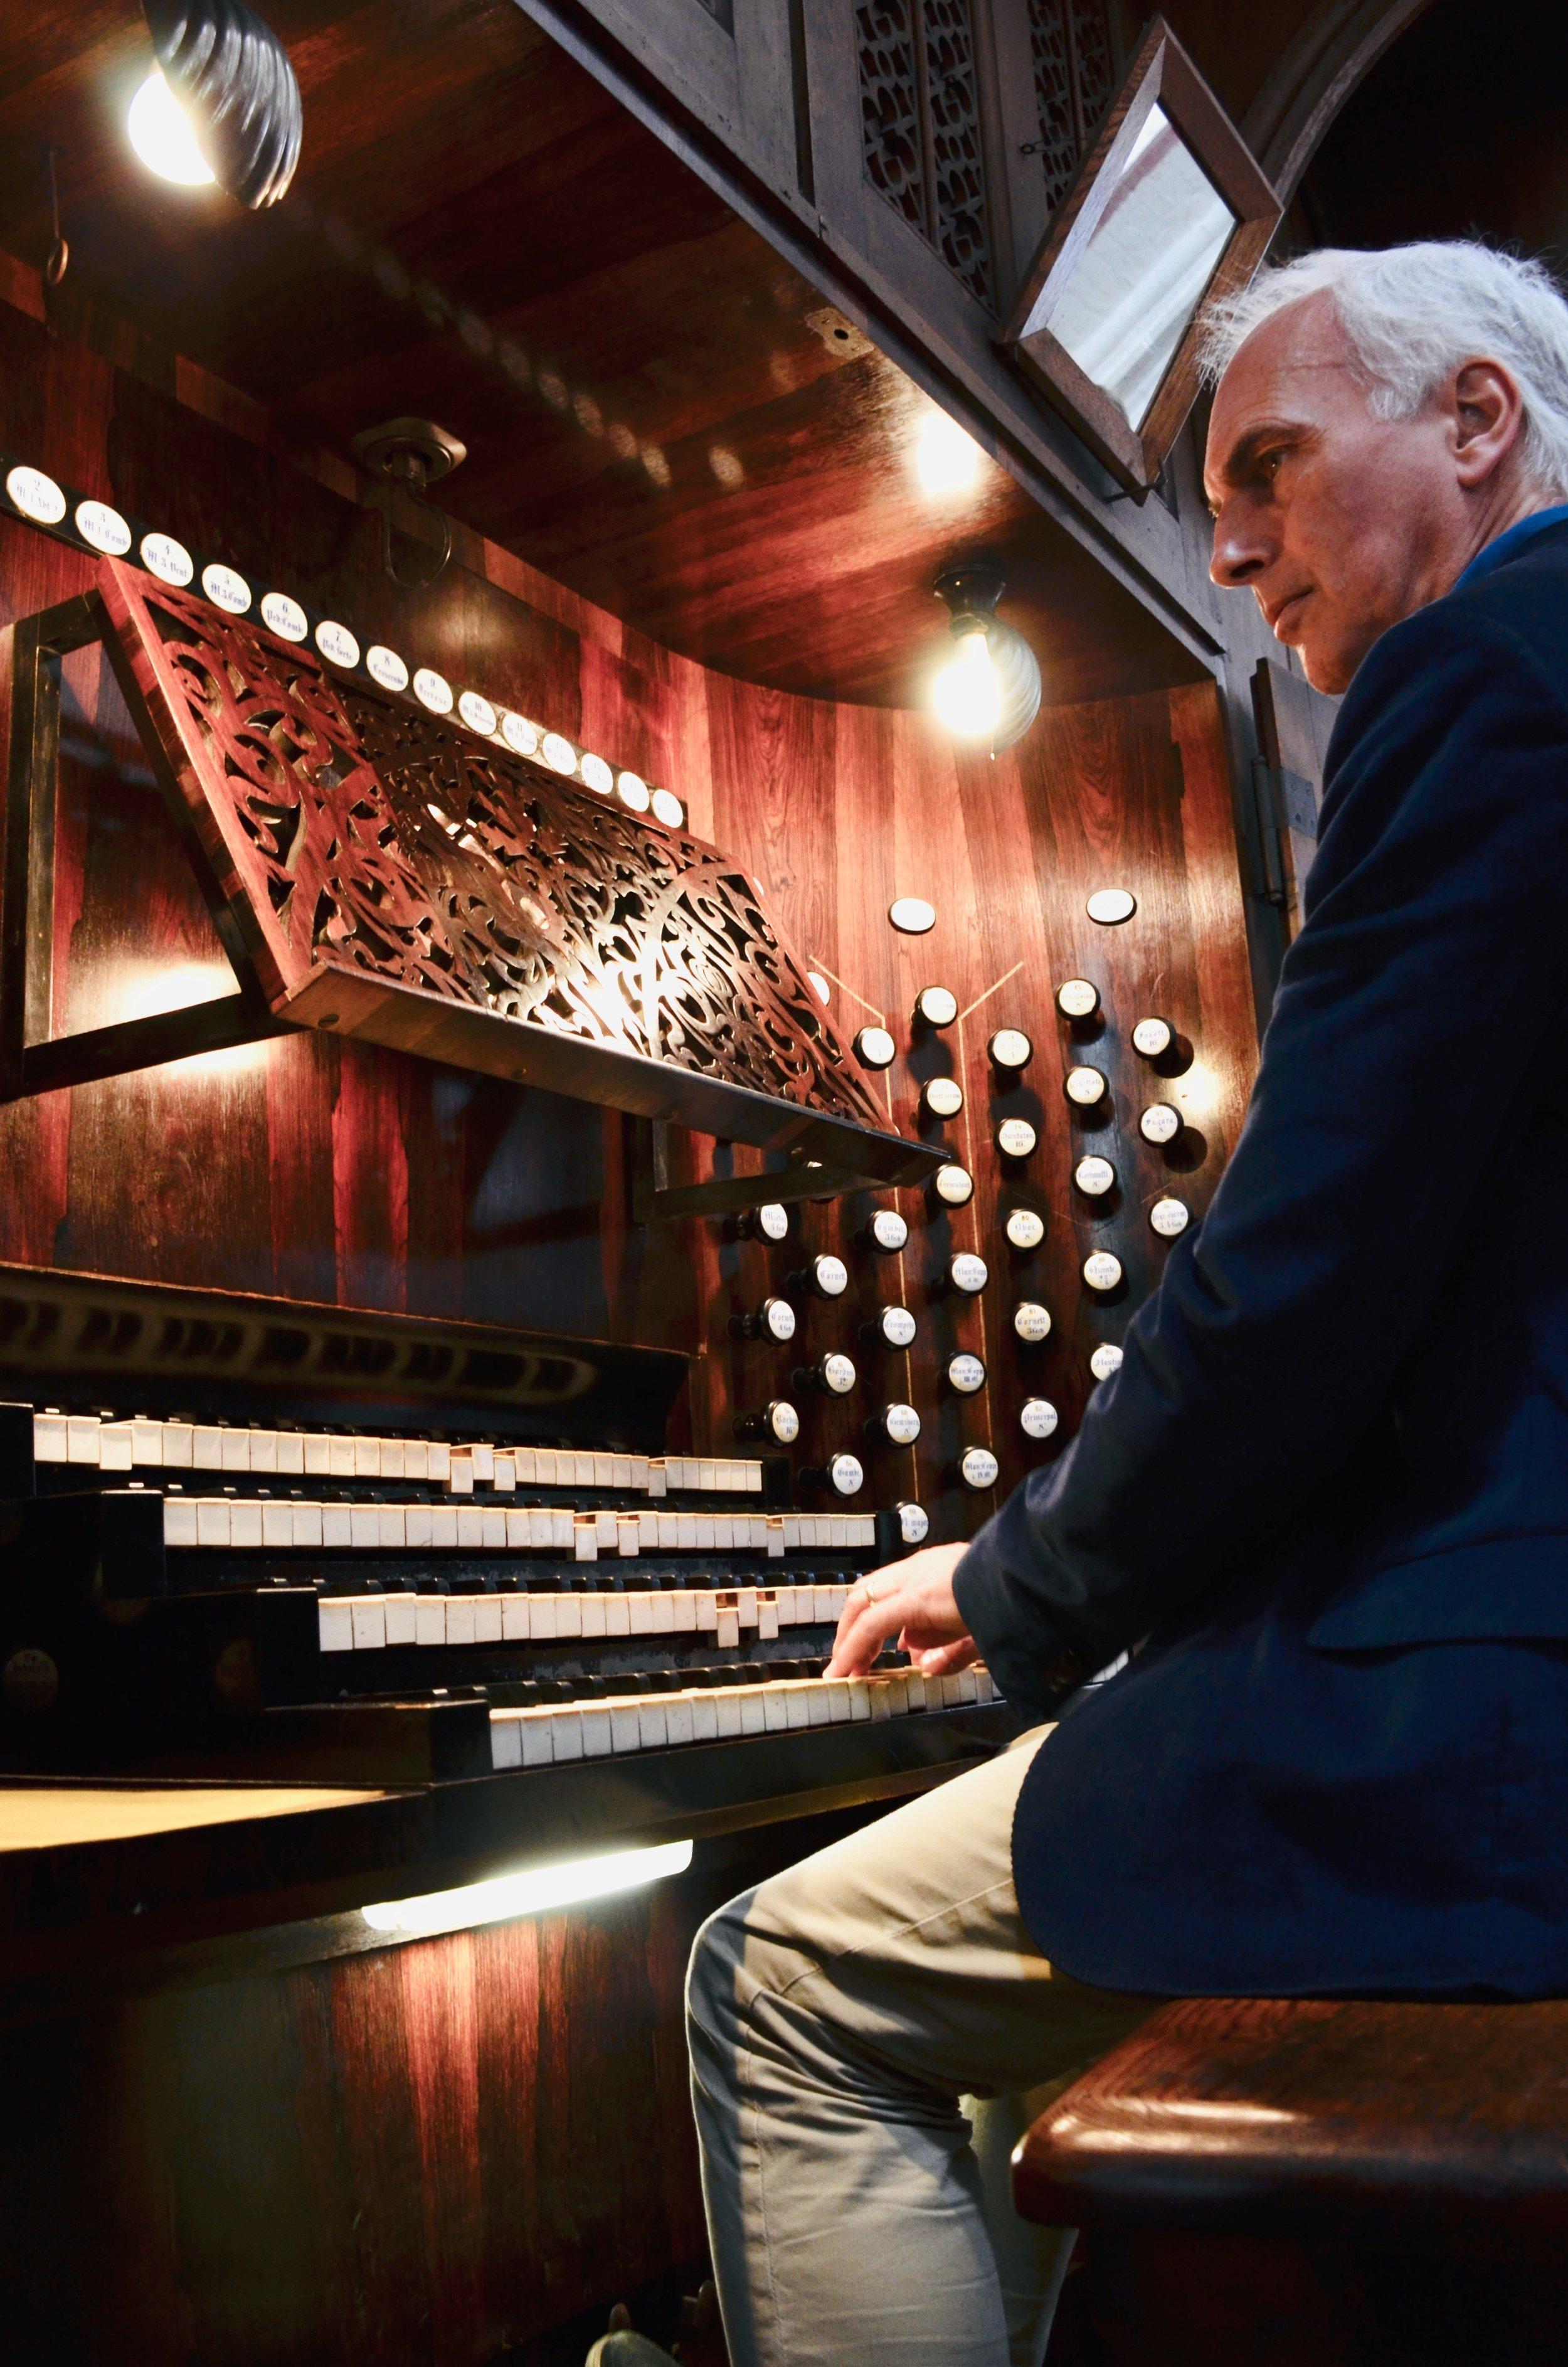 Prof. Jan Ernst demonstrates the 1871 Ladegast organ in Schwerin Cathedral. Boston Organ Studio.